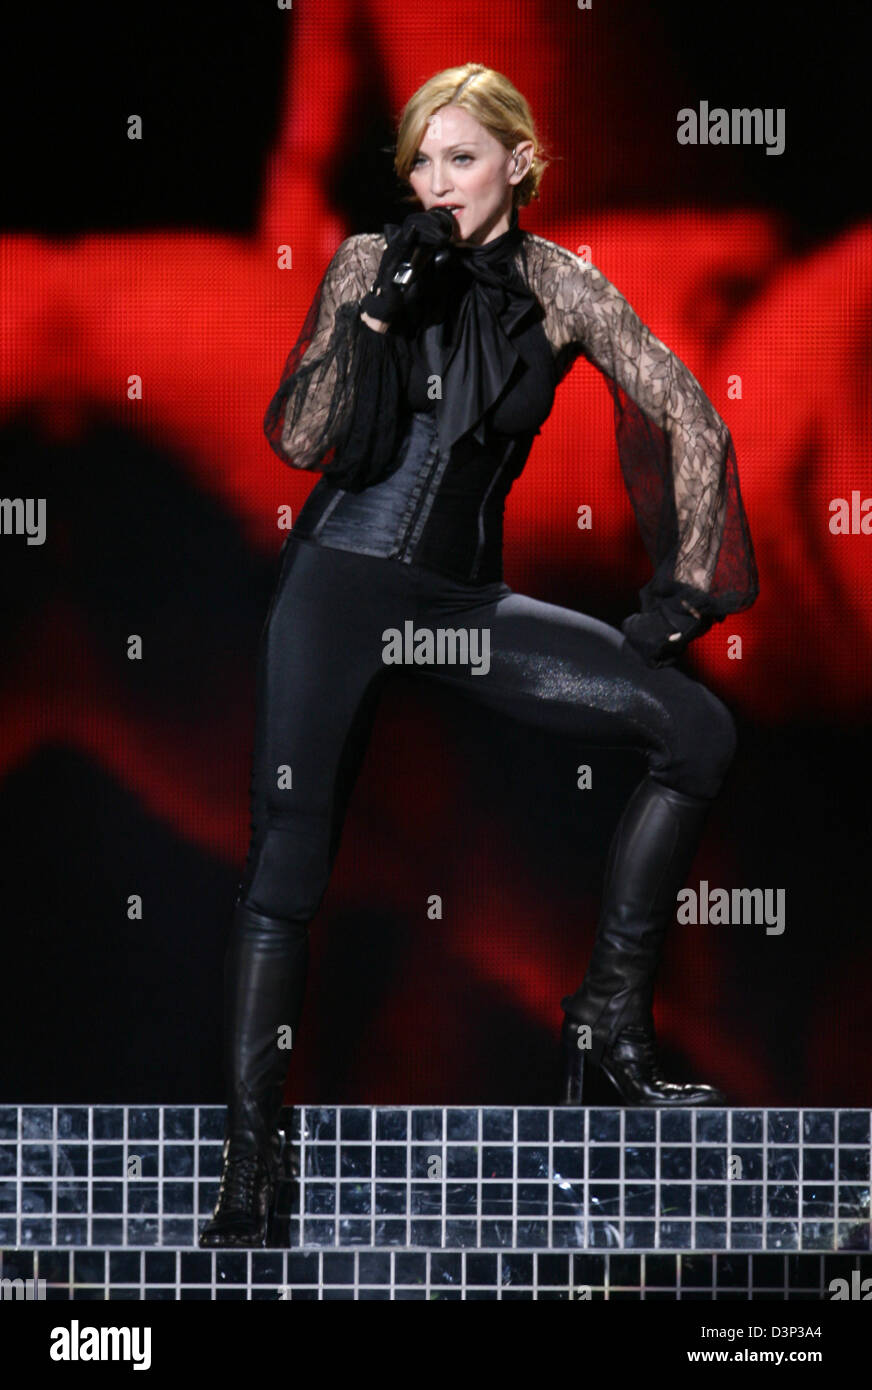 Madonna Confessions Tour Stock...